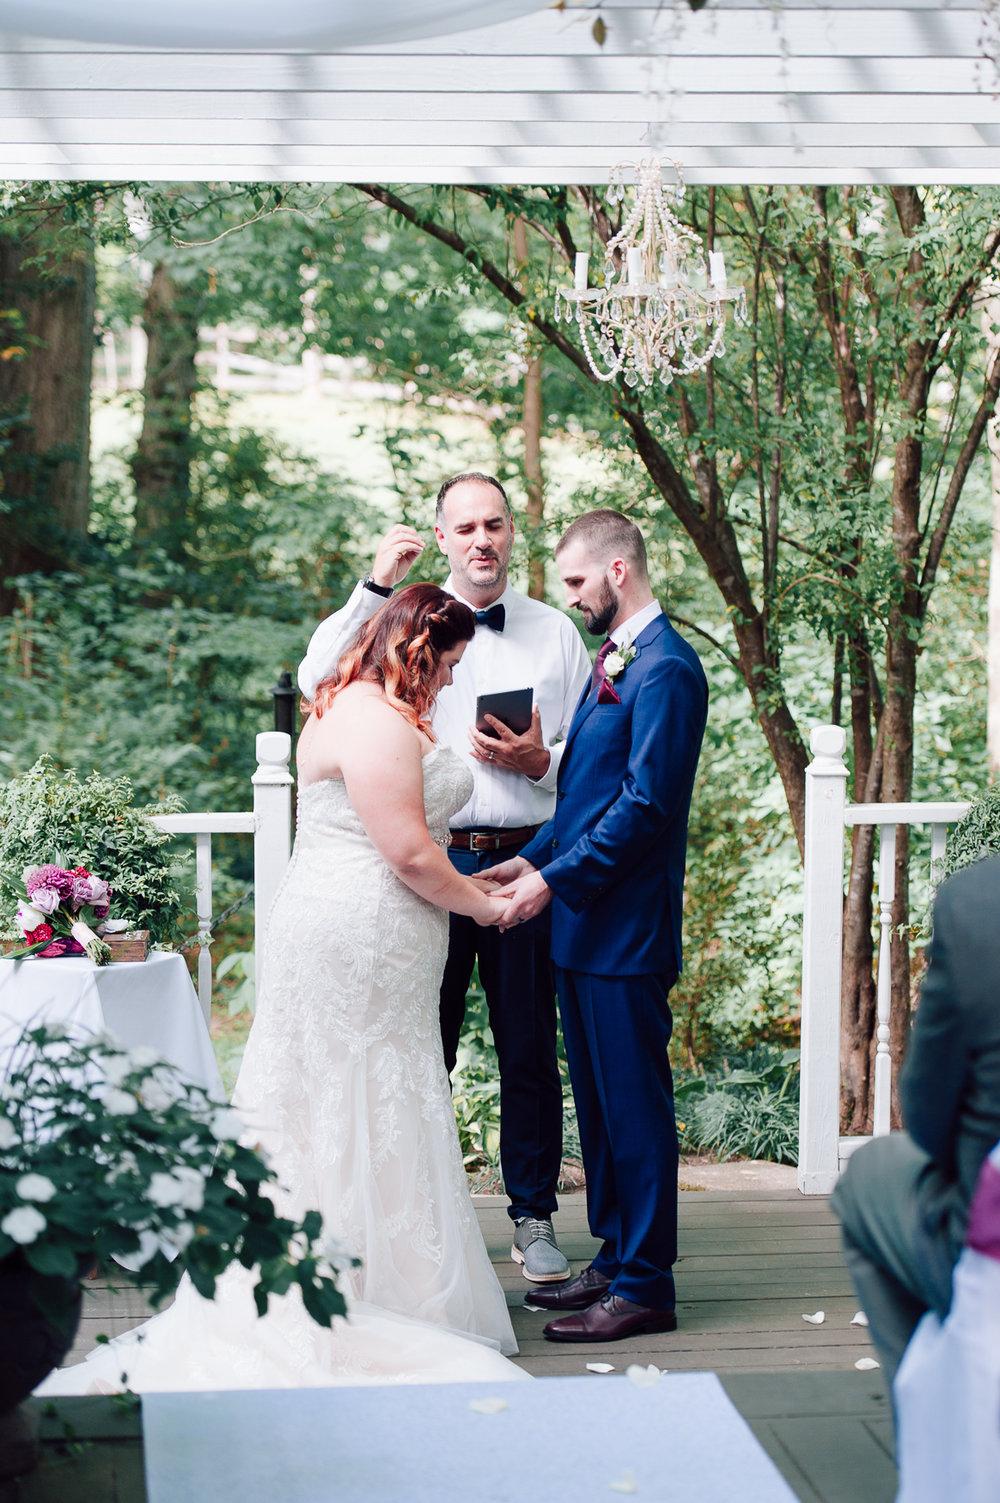 virginiawedding_GlenGarden_rusticwedding_fredericksburg_youseephotography_KellySteven (41).jpg